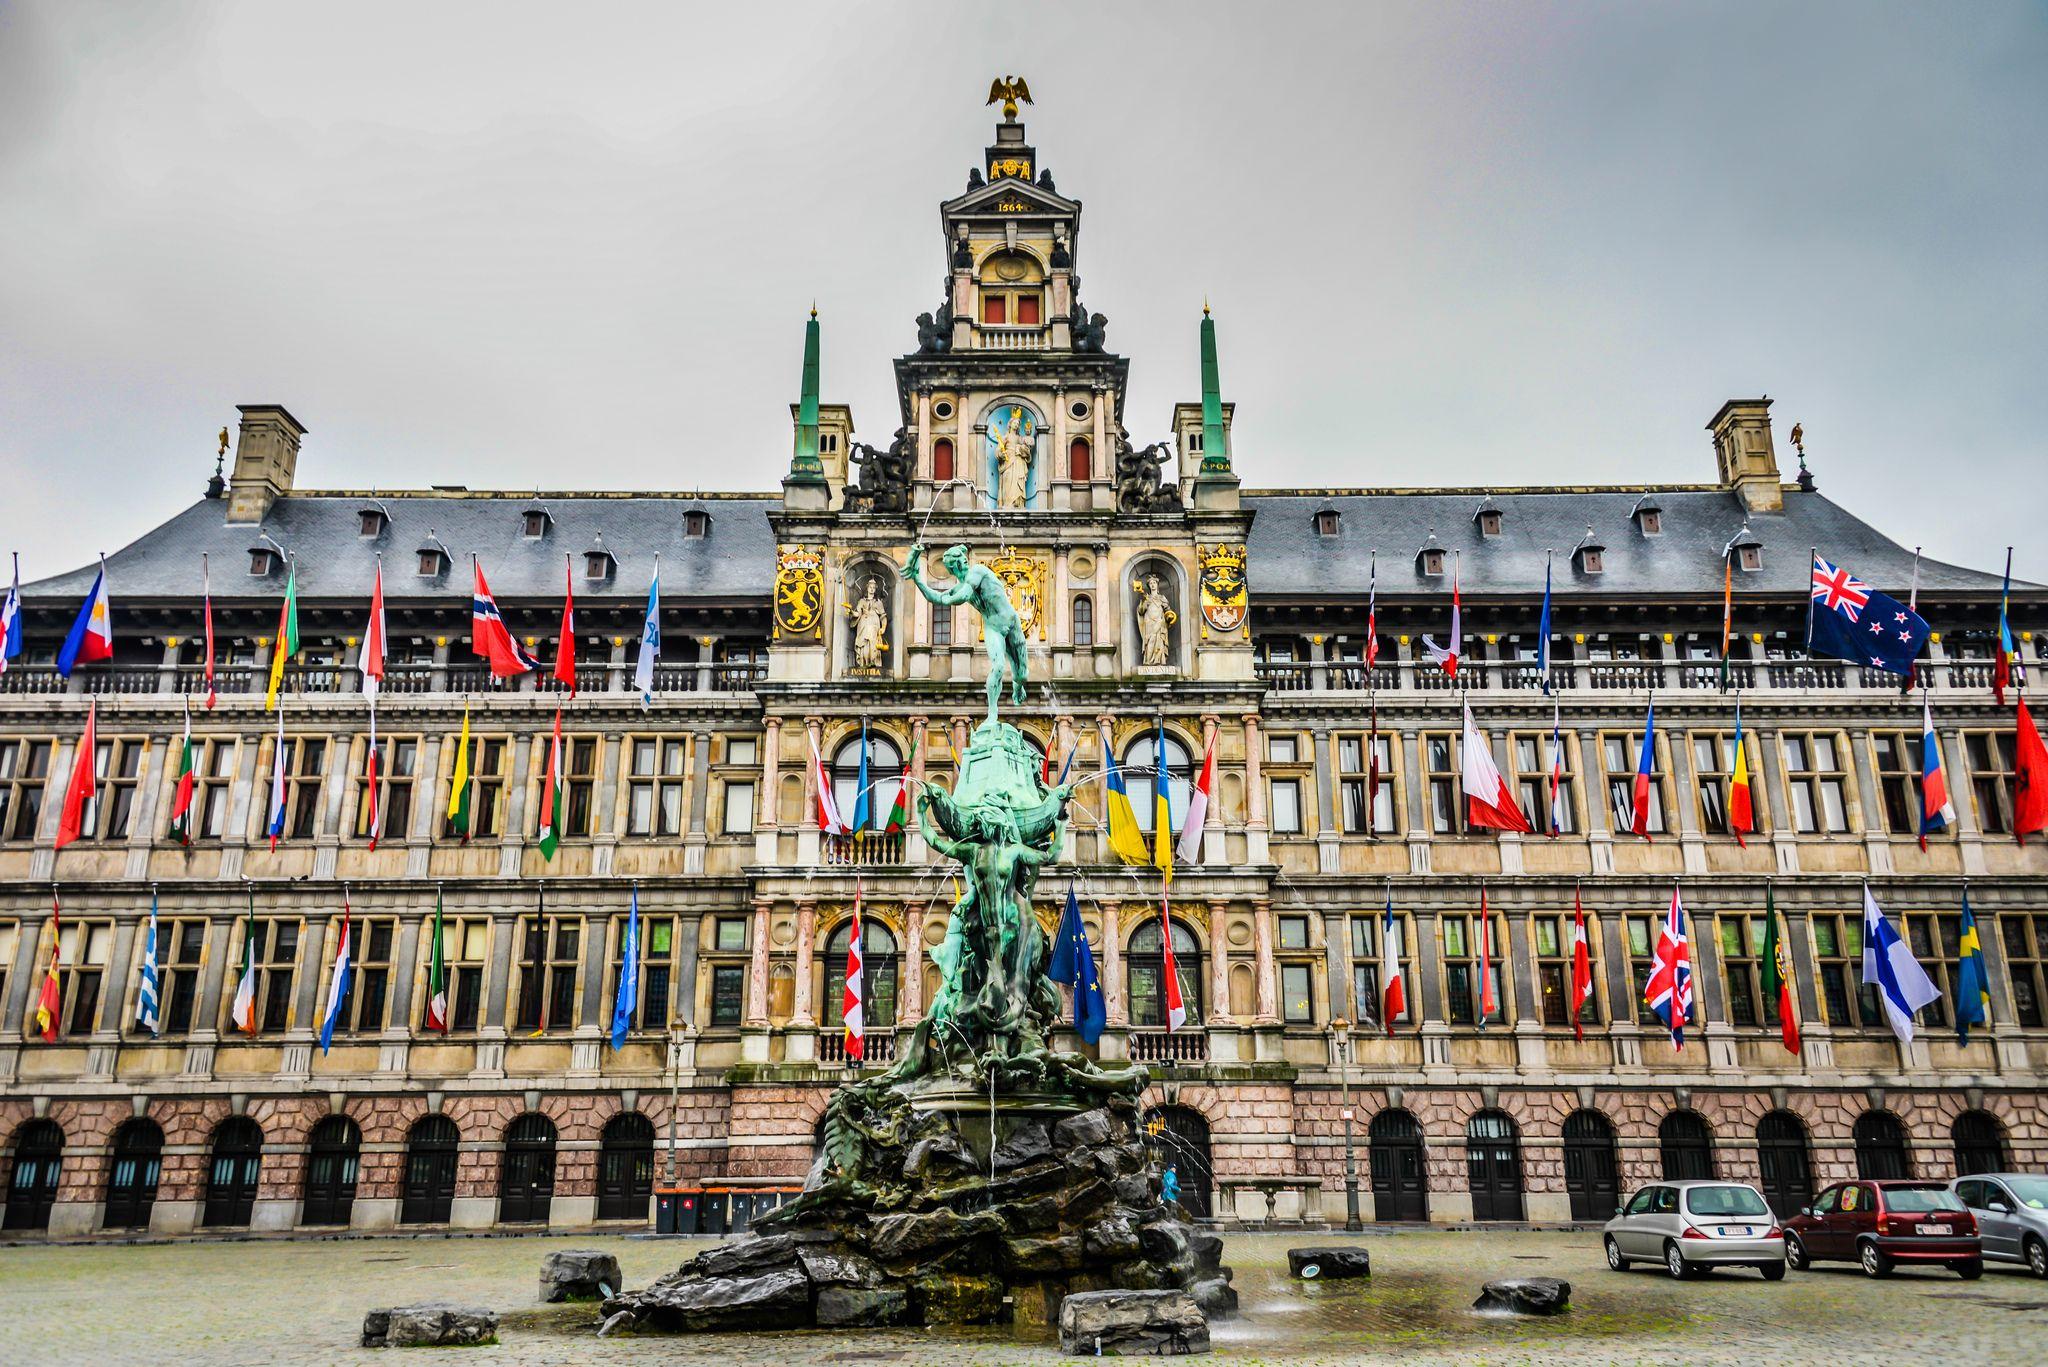 Stadhuis-atau-Town-Hall